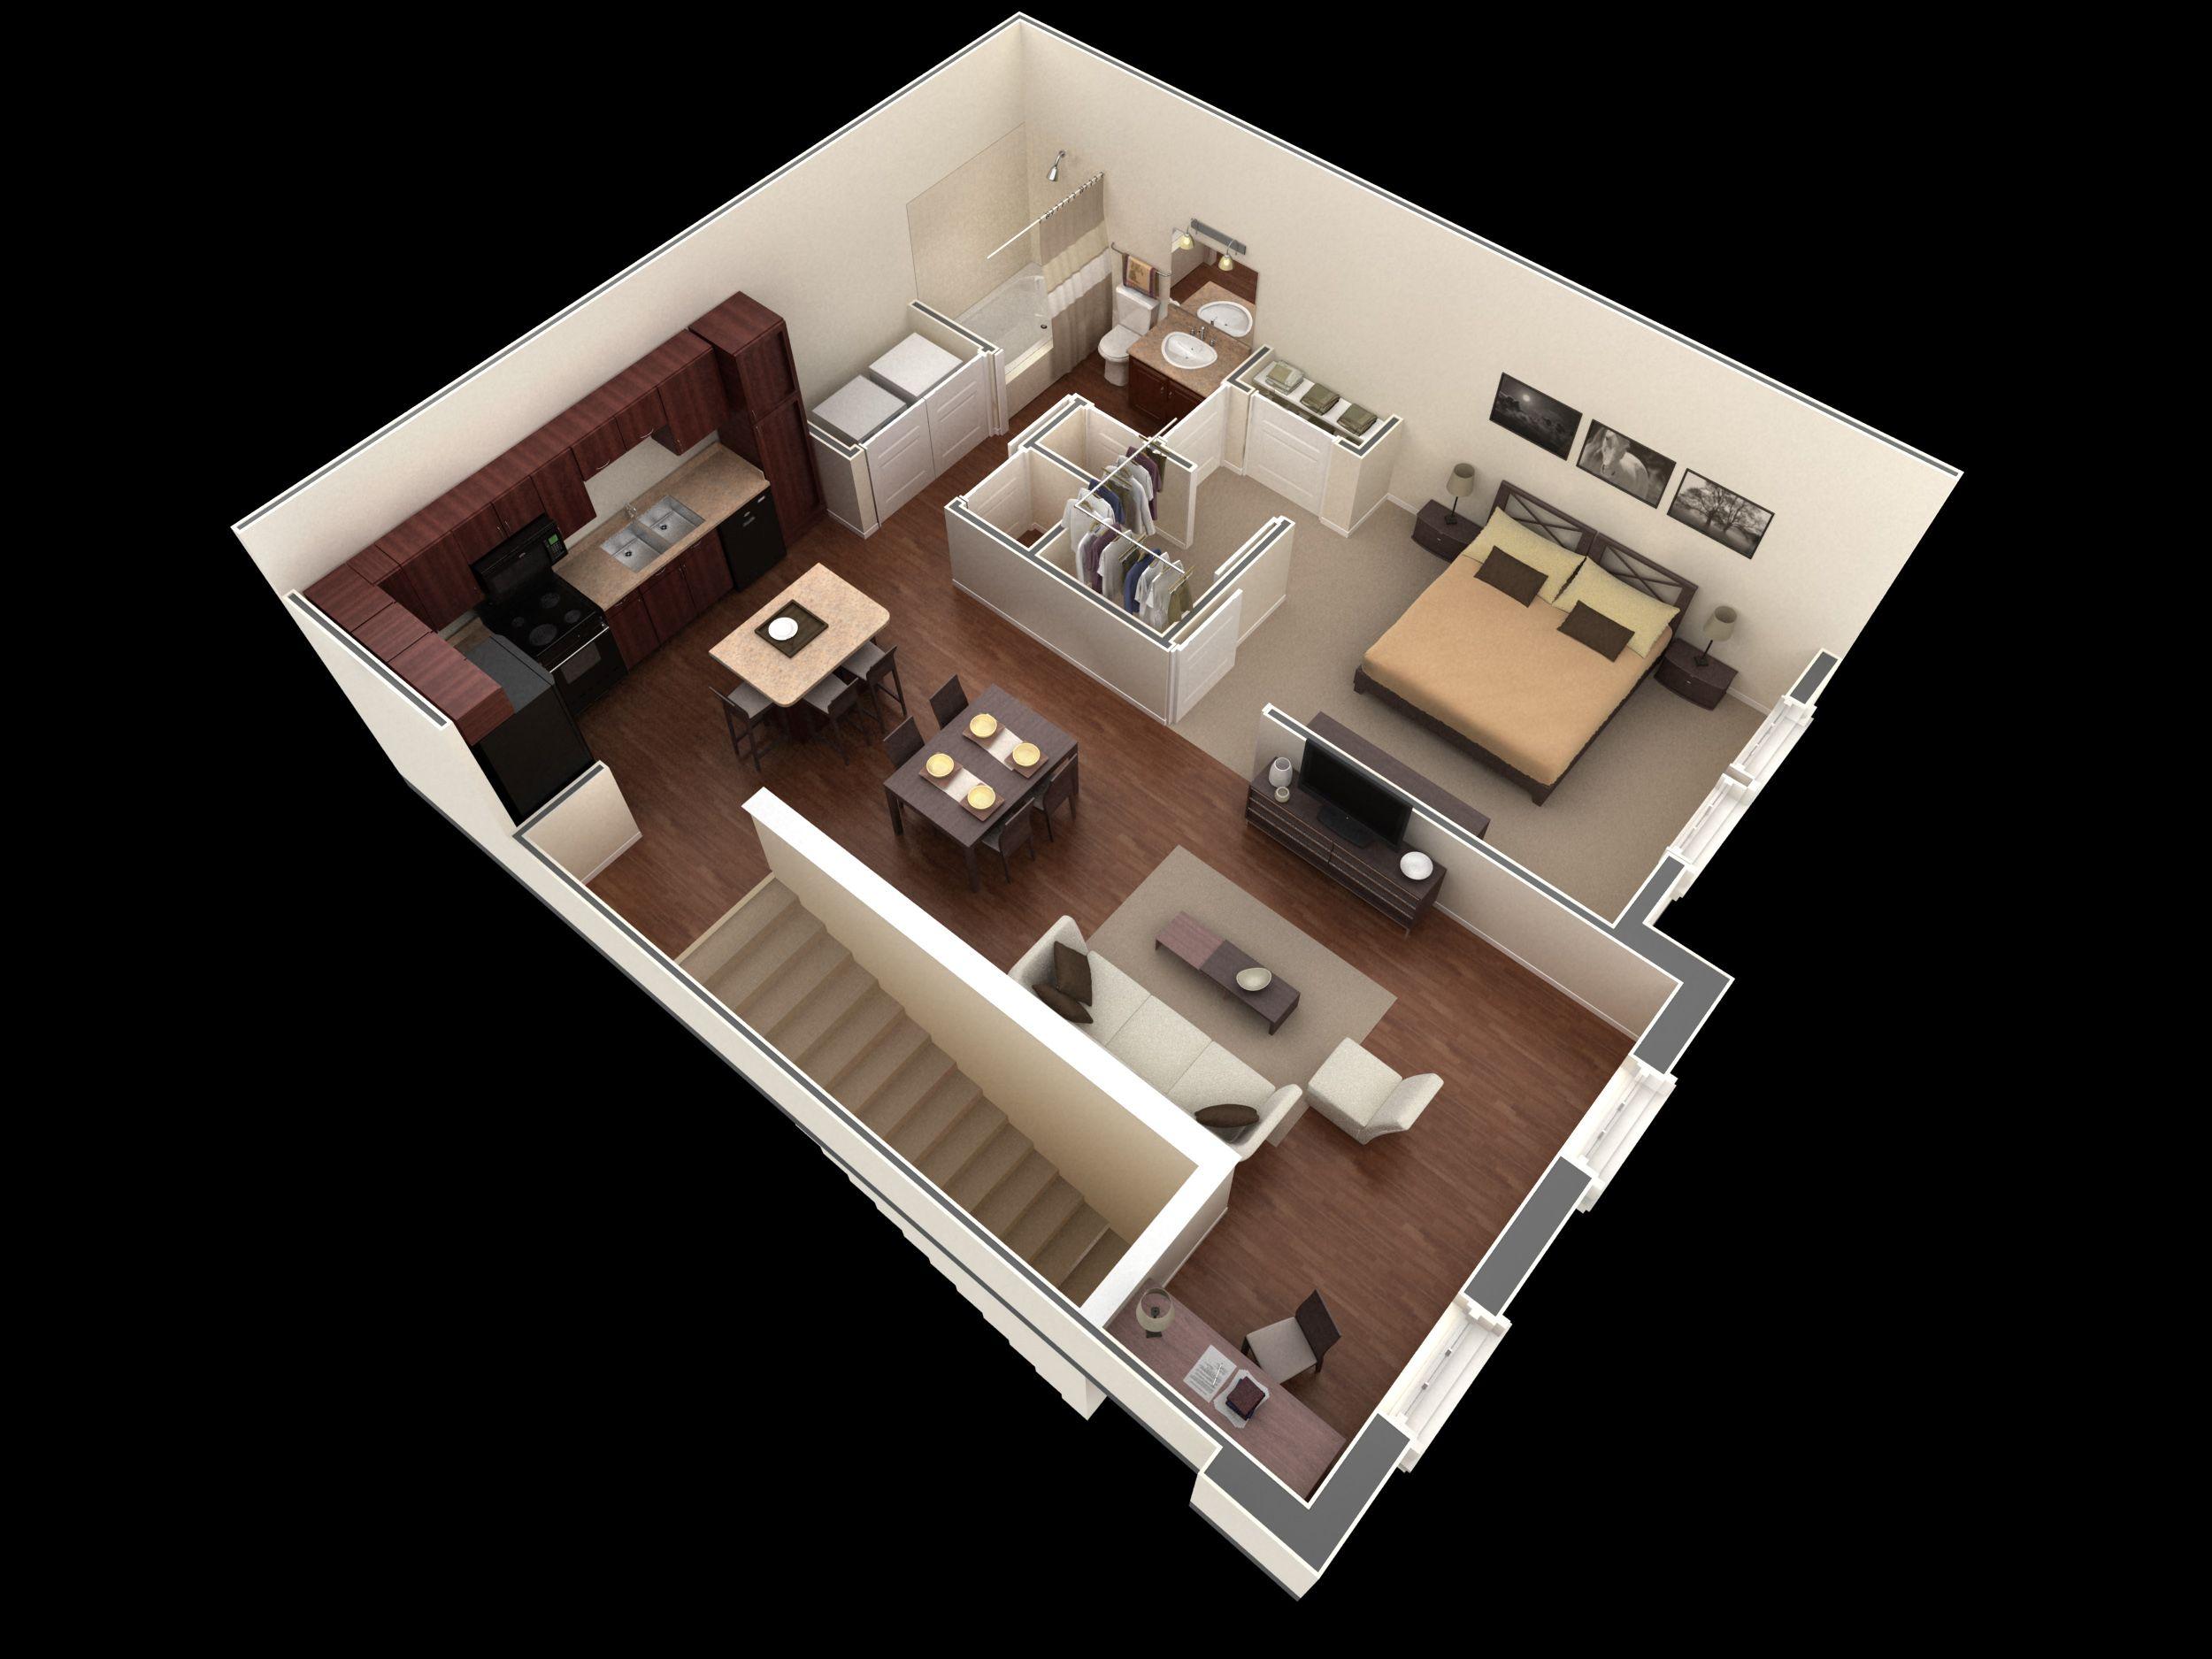 in san bedroom antonio apartments one cheap oozoraya